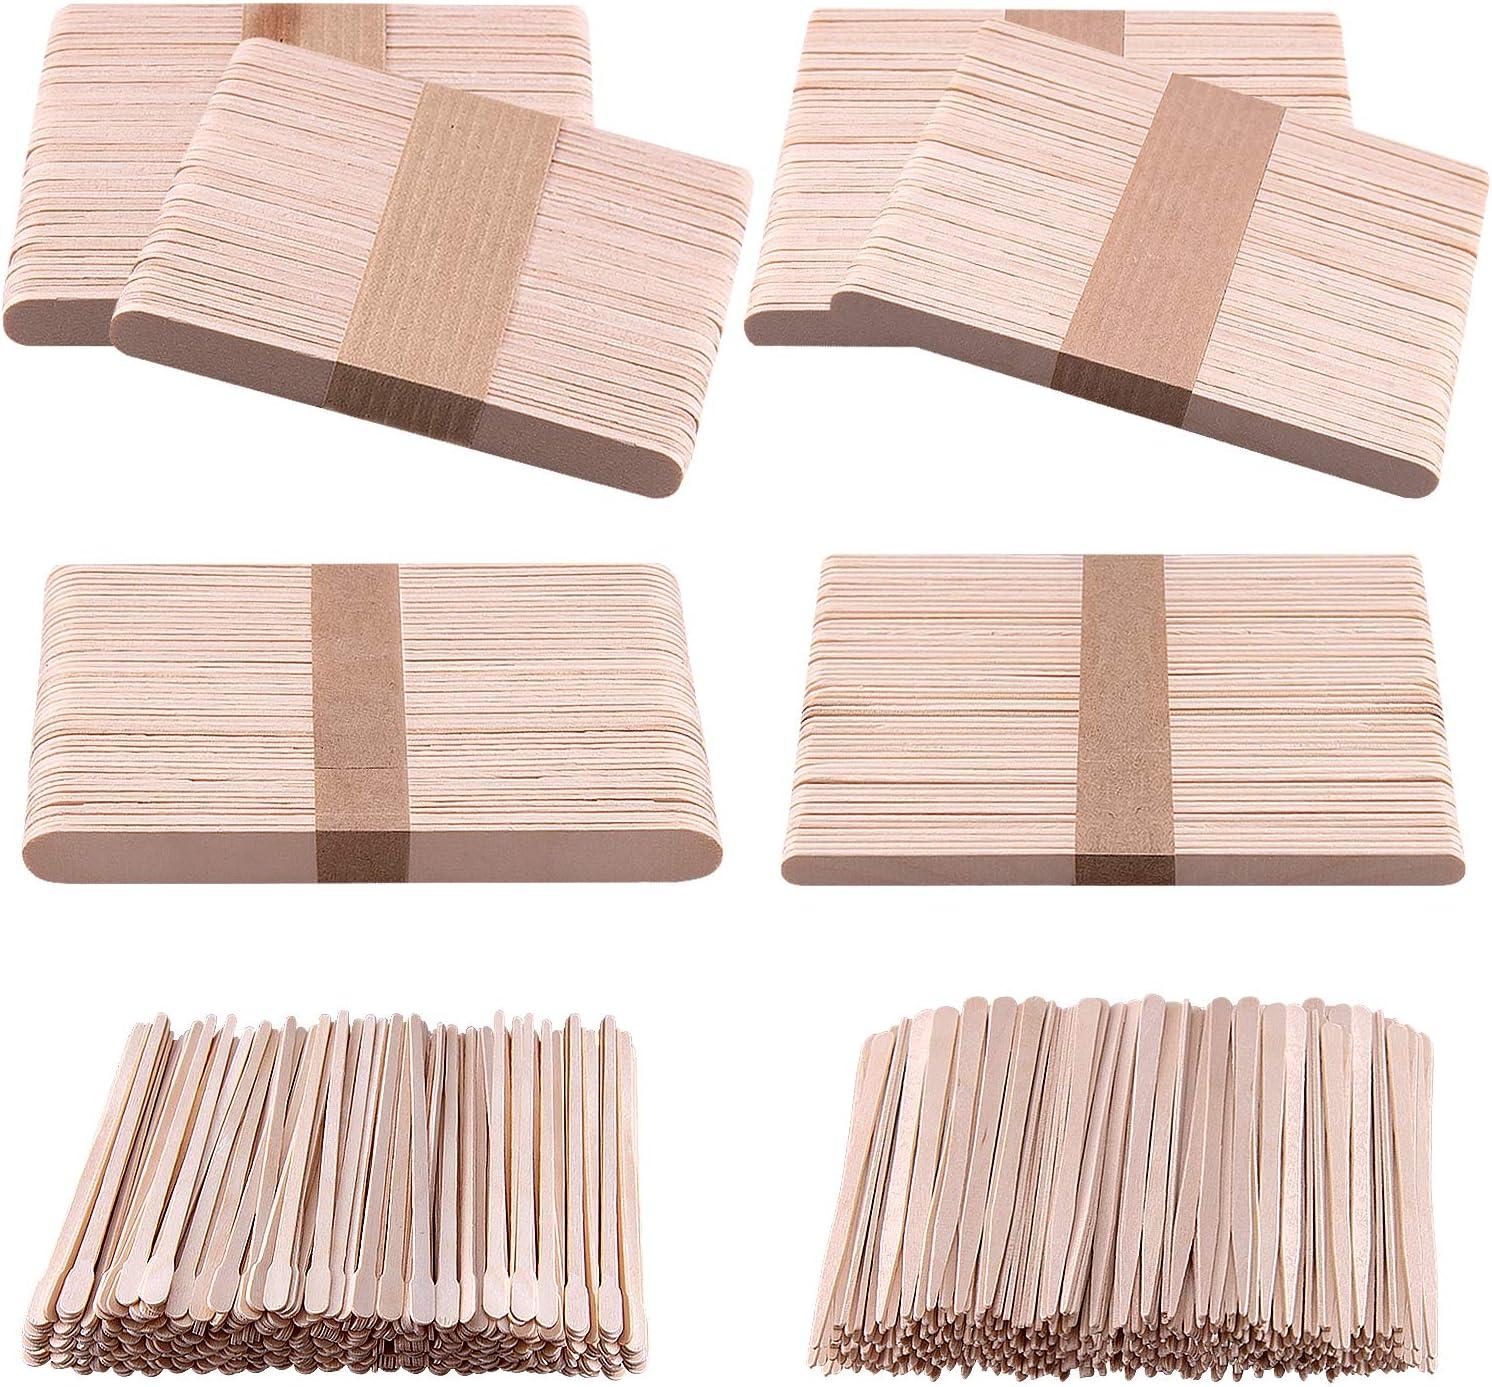 BQTQ Max 87% OFF Manufacturer direct delivery 1000 Pieces Wooden Wax Applicator Spatulas S Sticks